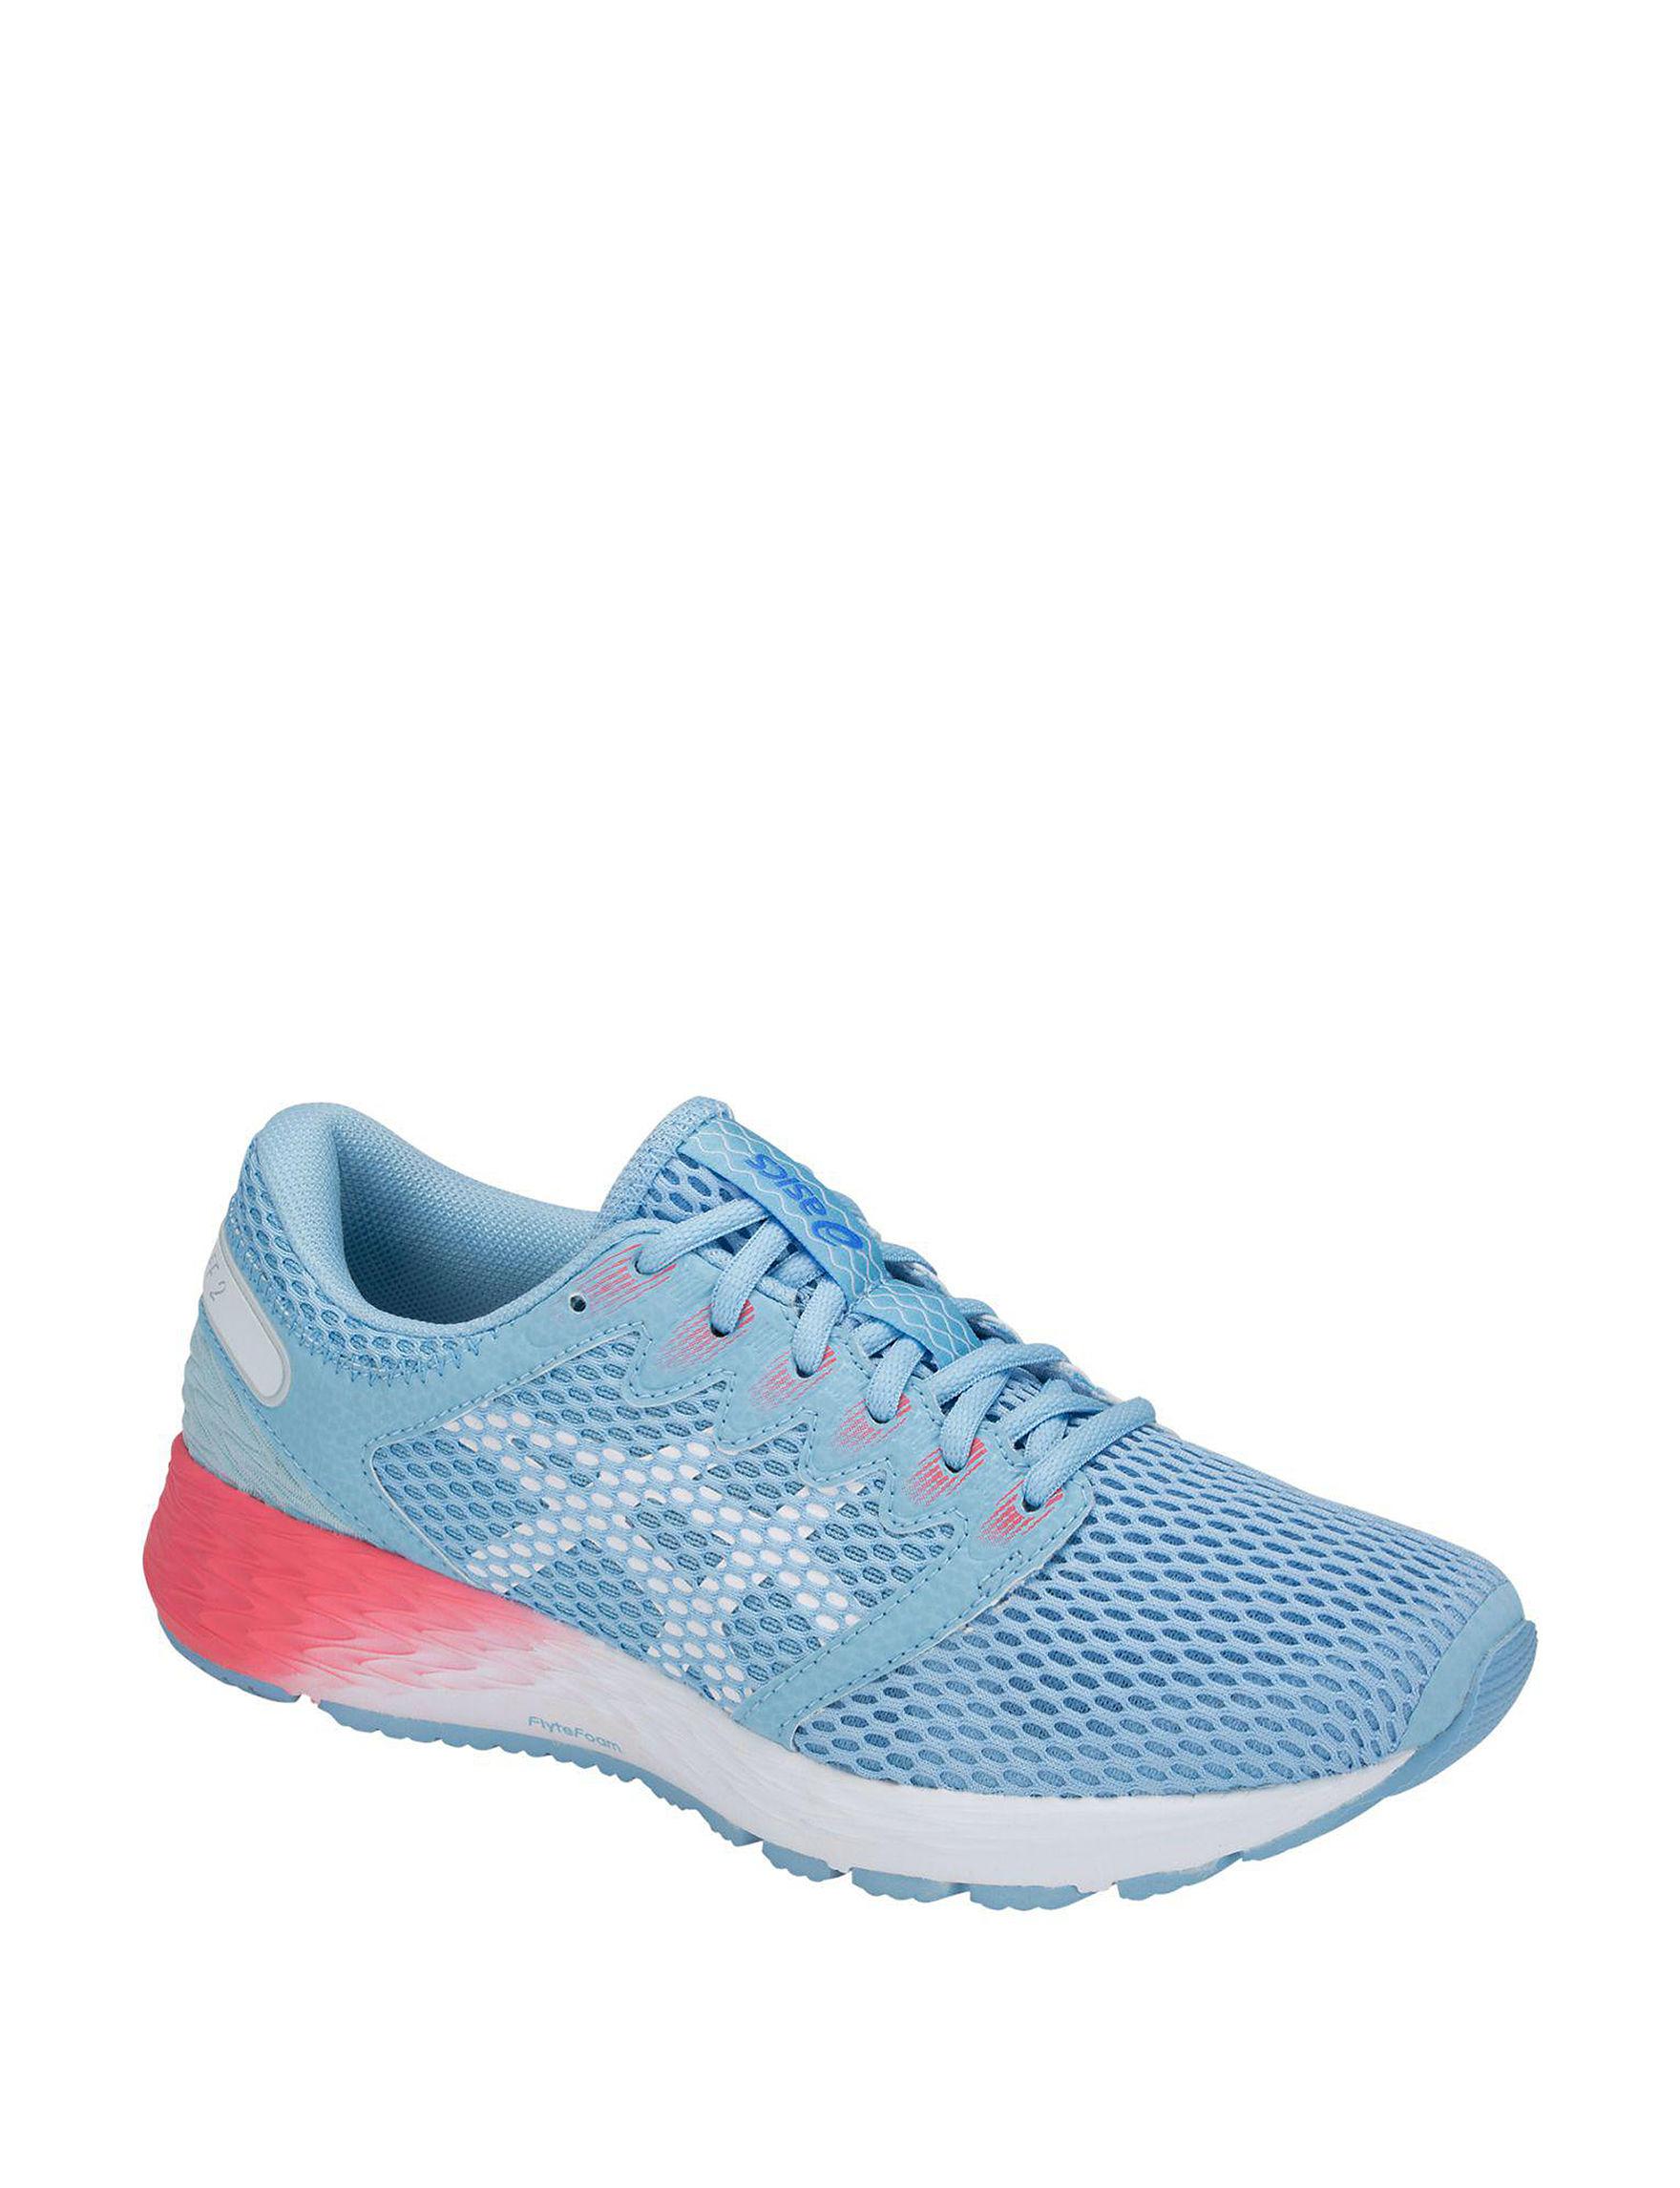 Mx Stores ShoesStage Athletic 2 Ff Asics Roadhawk ukOPXZi